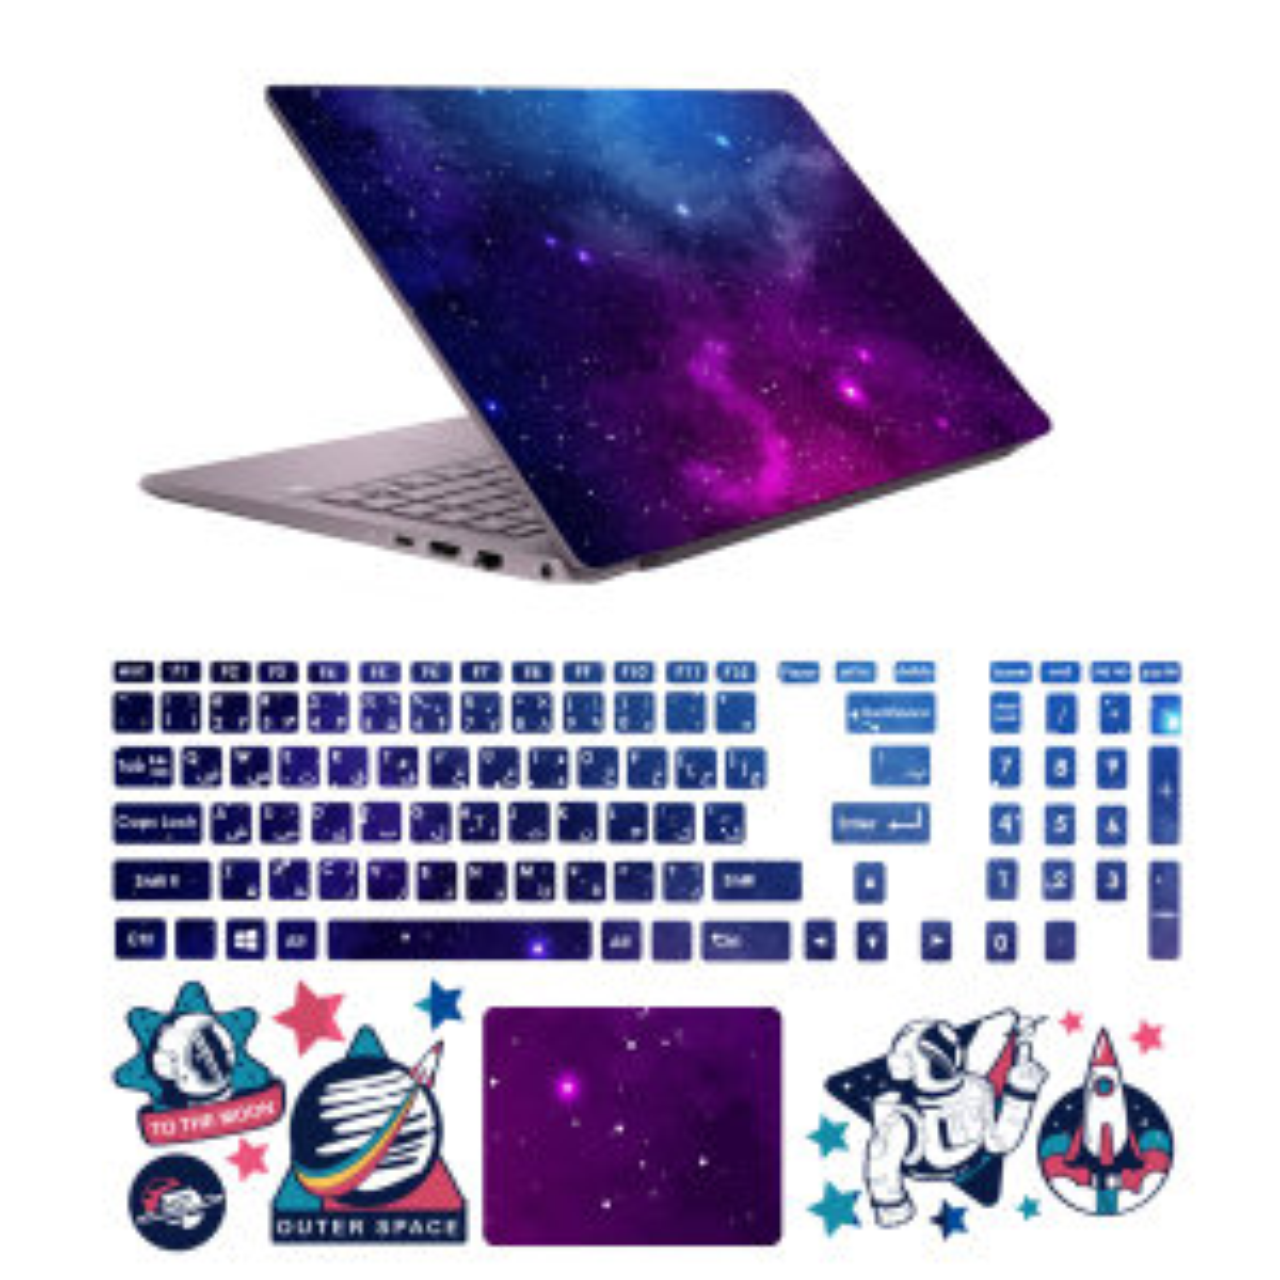 استیکر لپ تاپ صالسو آرت مدل 5081 hk به همراه برچسب حروف فارسی کیبورد